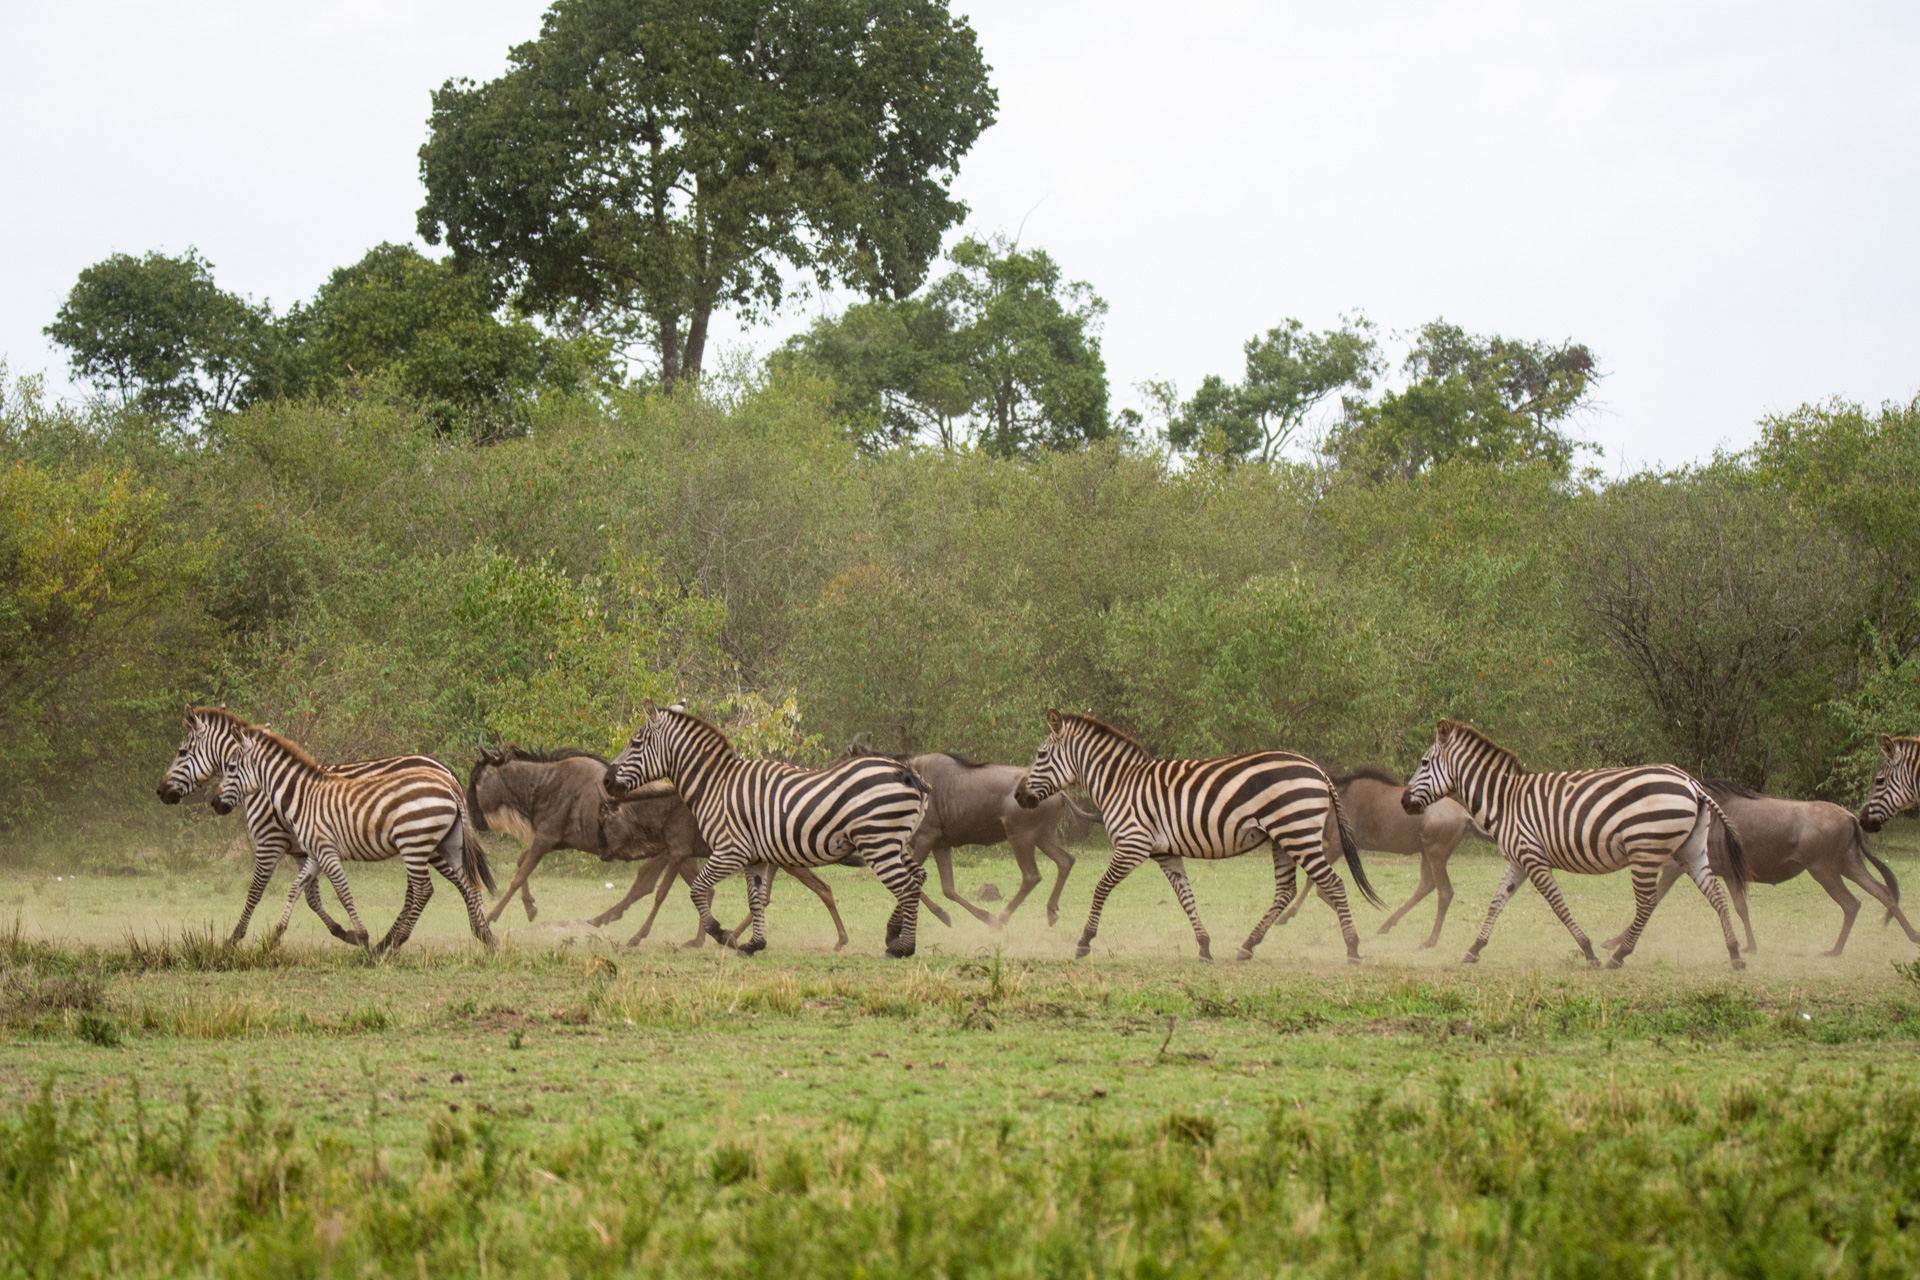 Zebra on the move